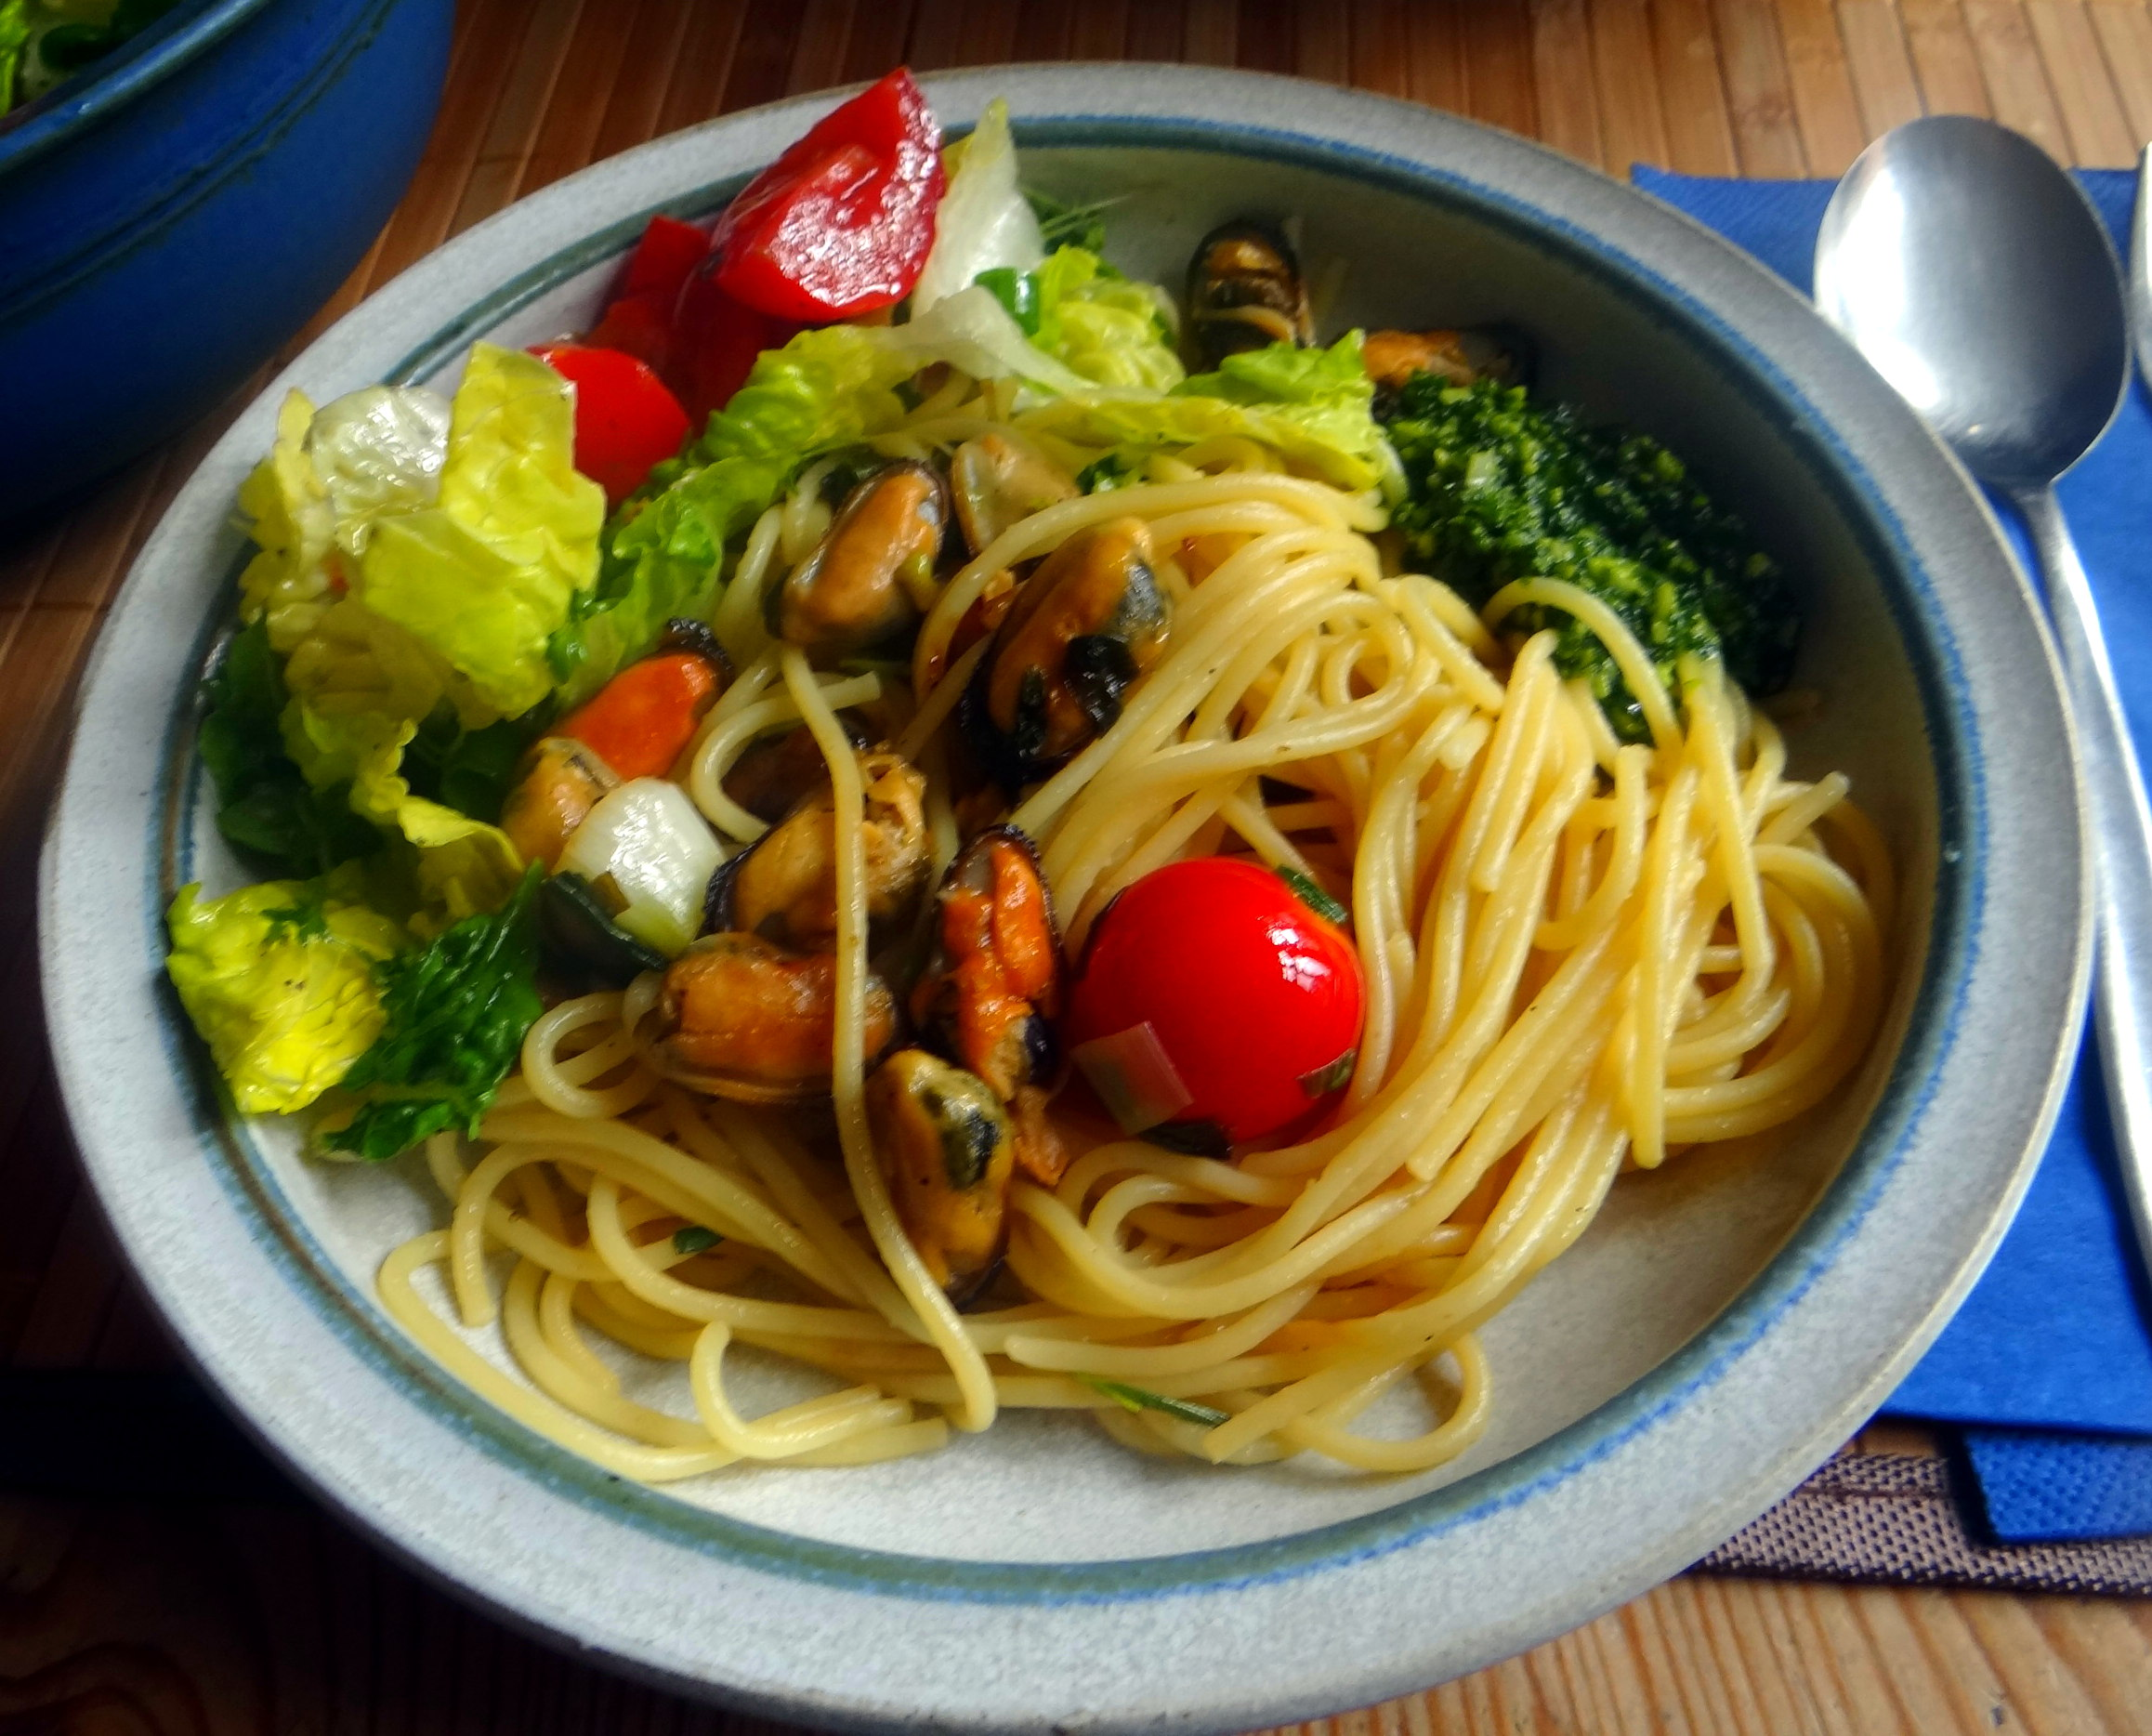 Spaghetti,Pesto,Muscheln,Salat (2)